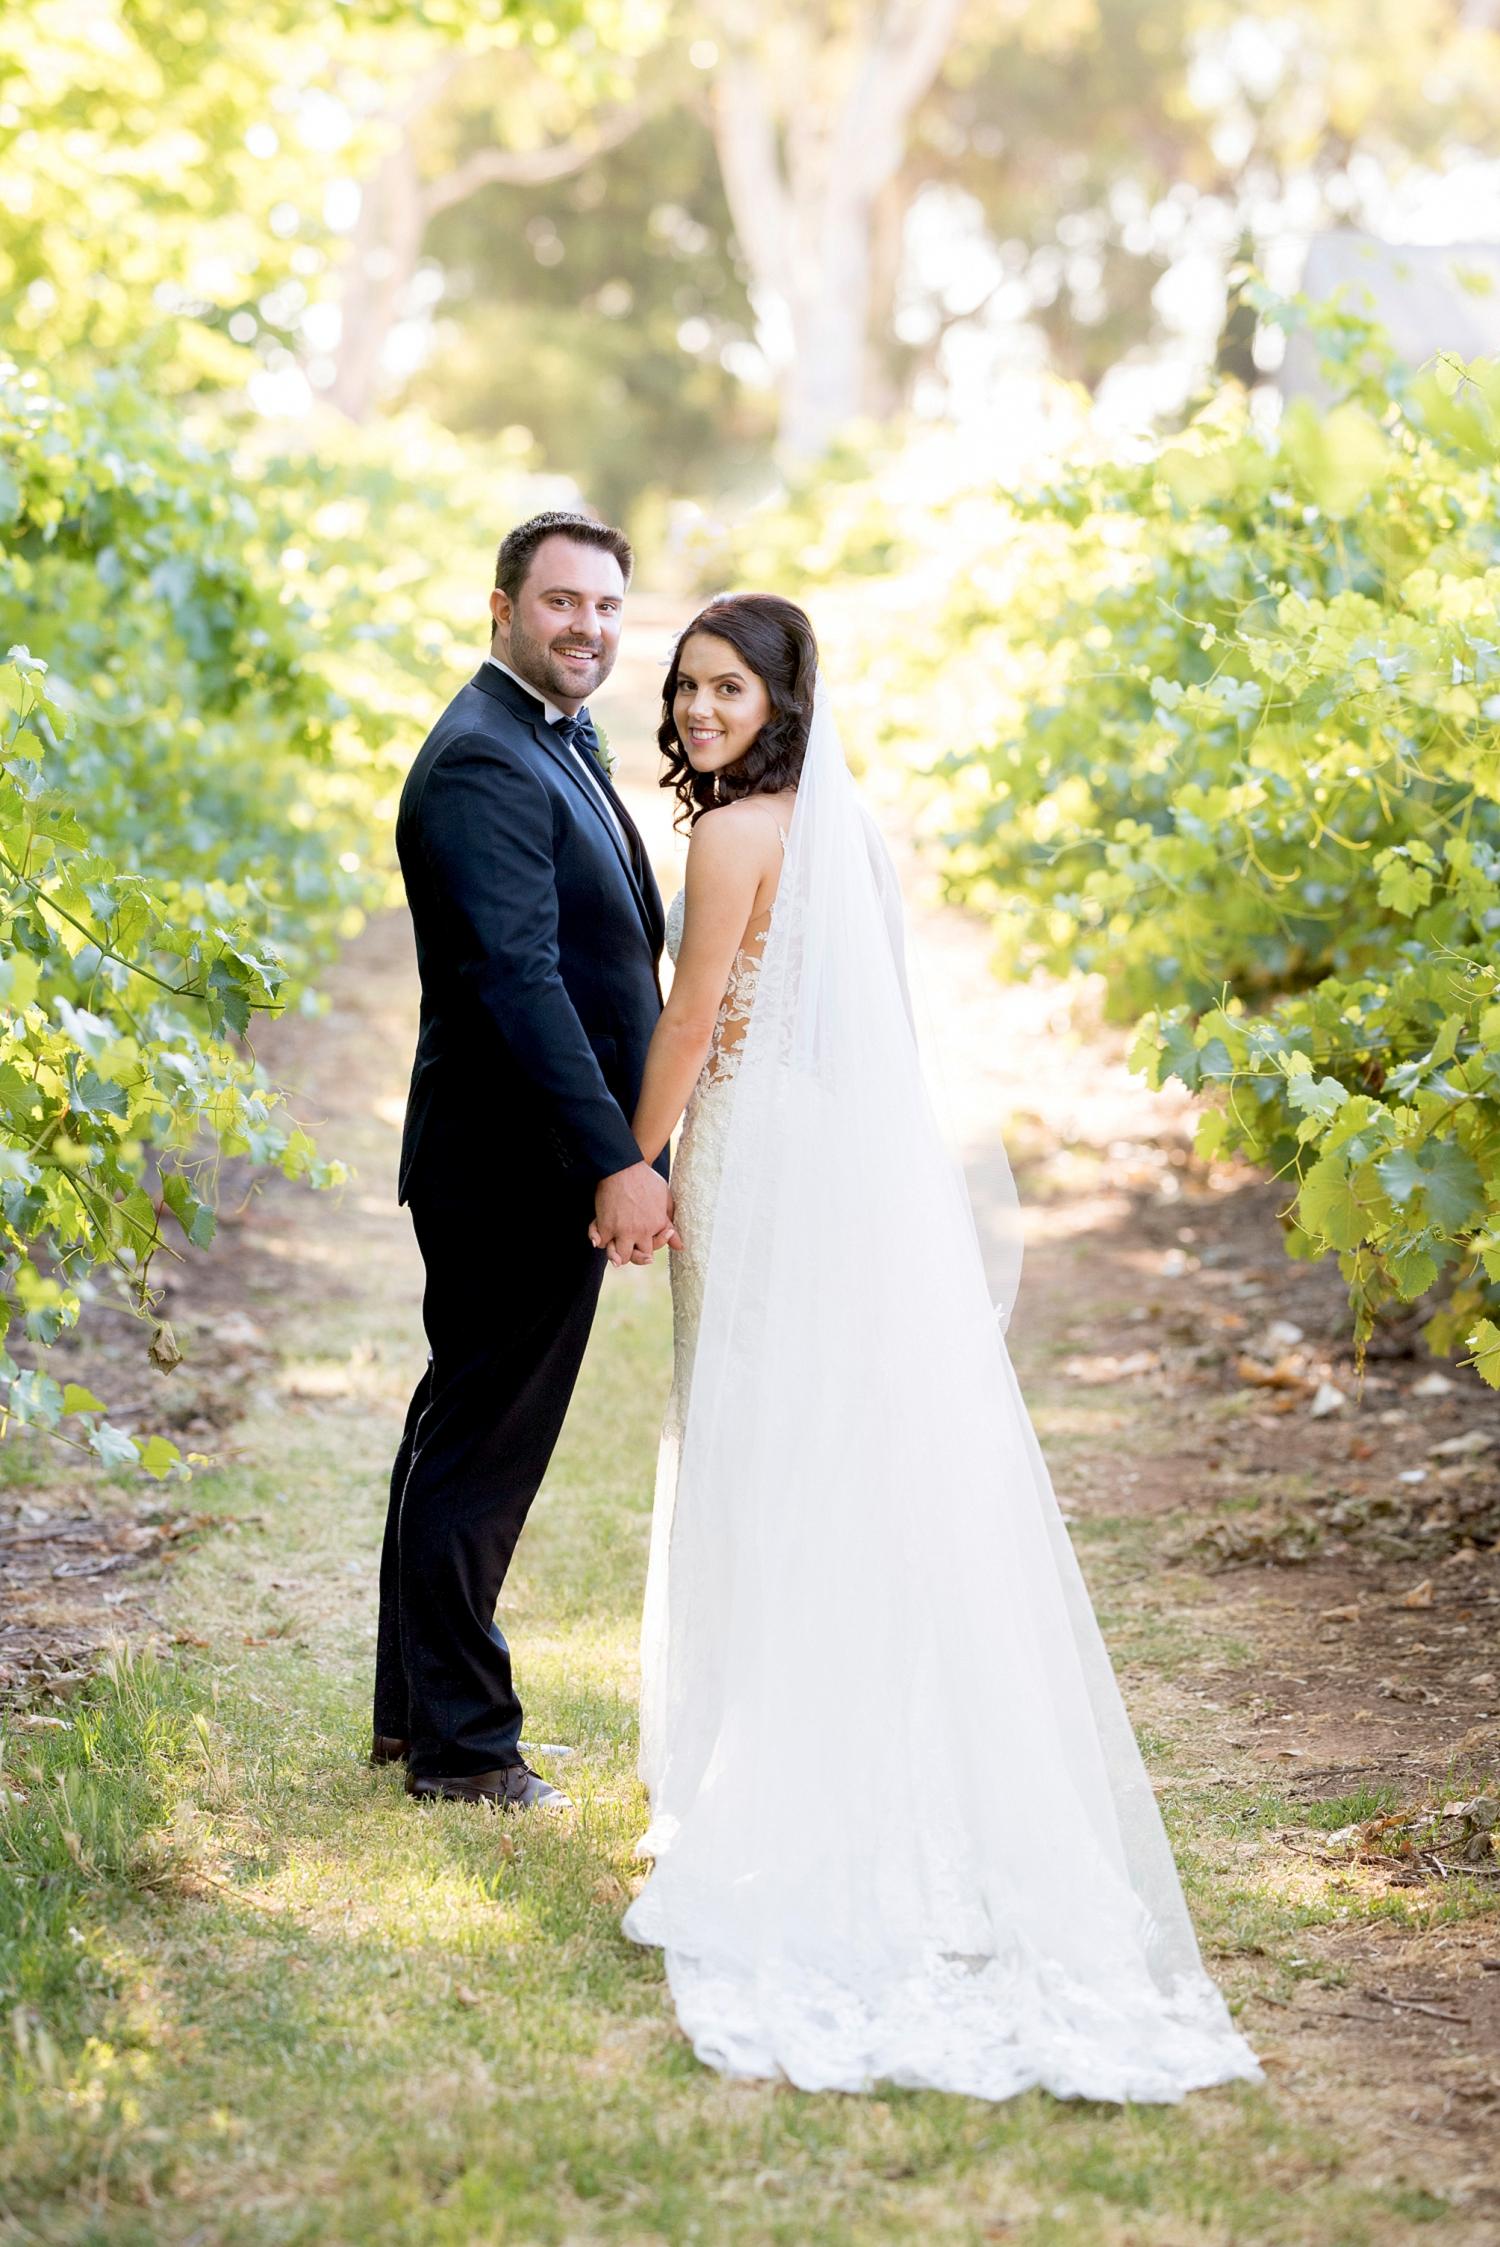 50_sandalford winery wedding perth.jpg